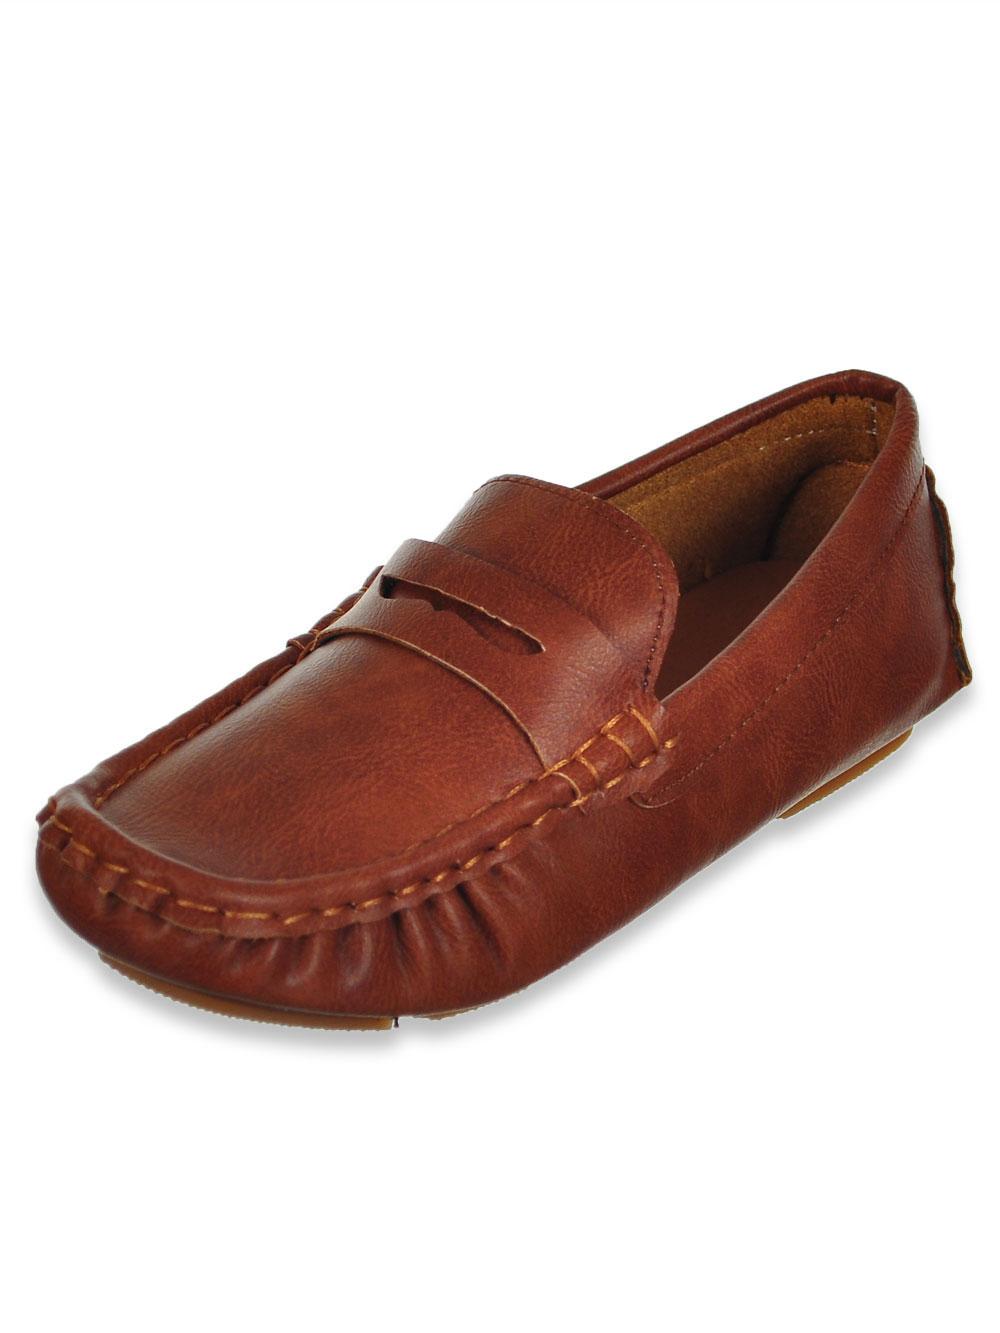 Eddie Marc Boys' Penny Loafers (Sizes 5